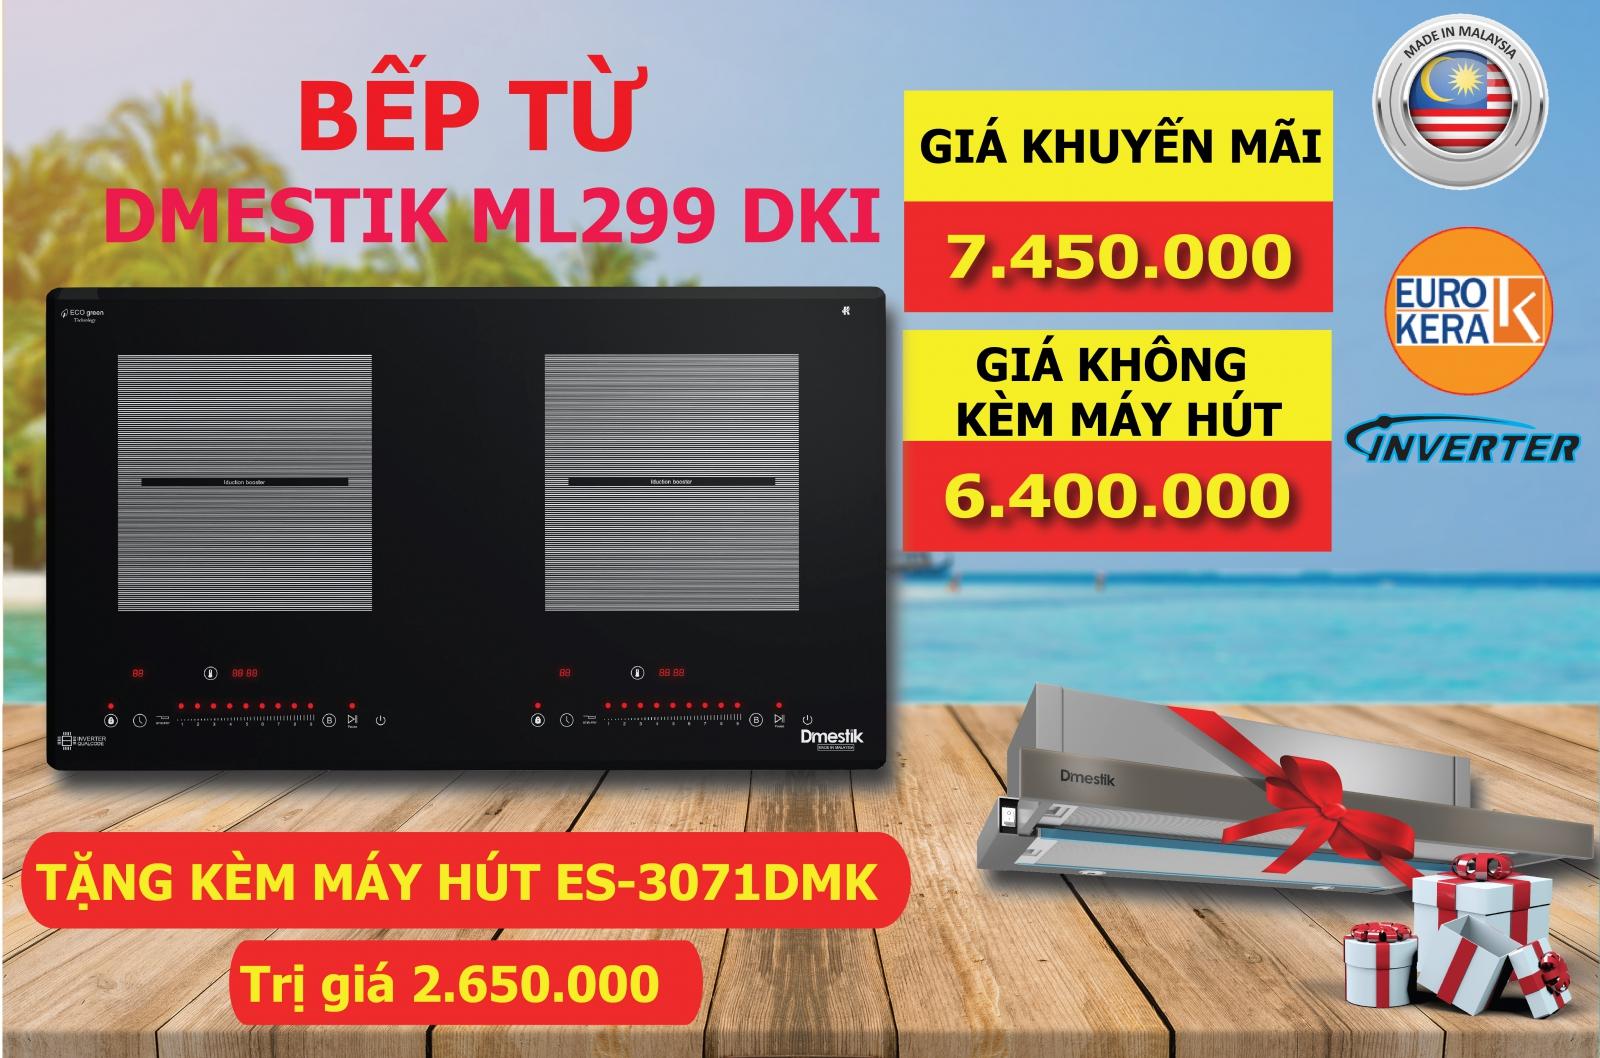 bep-tu-Dmestik299